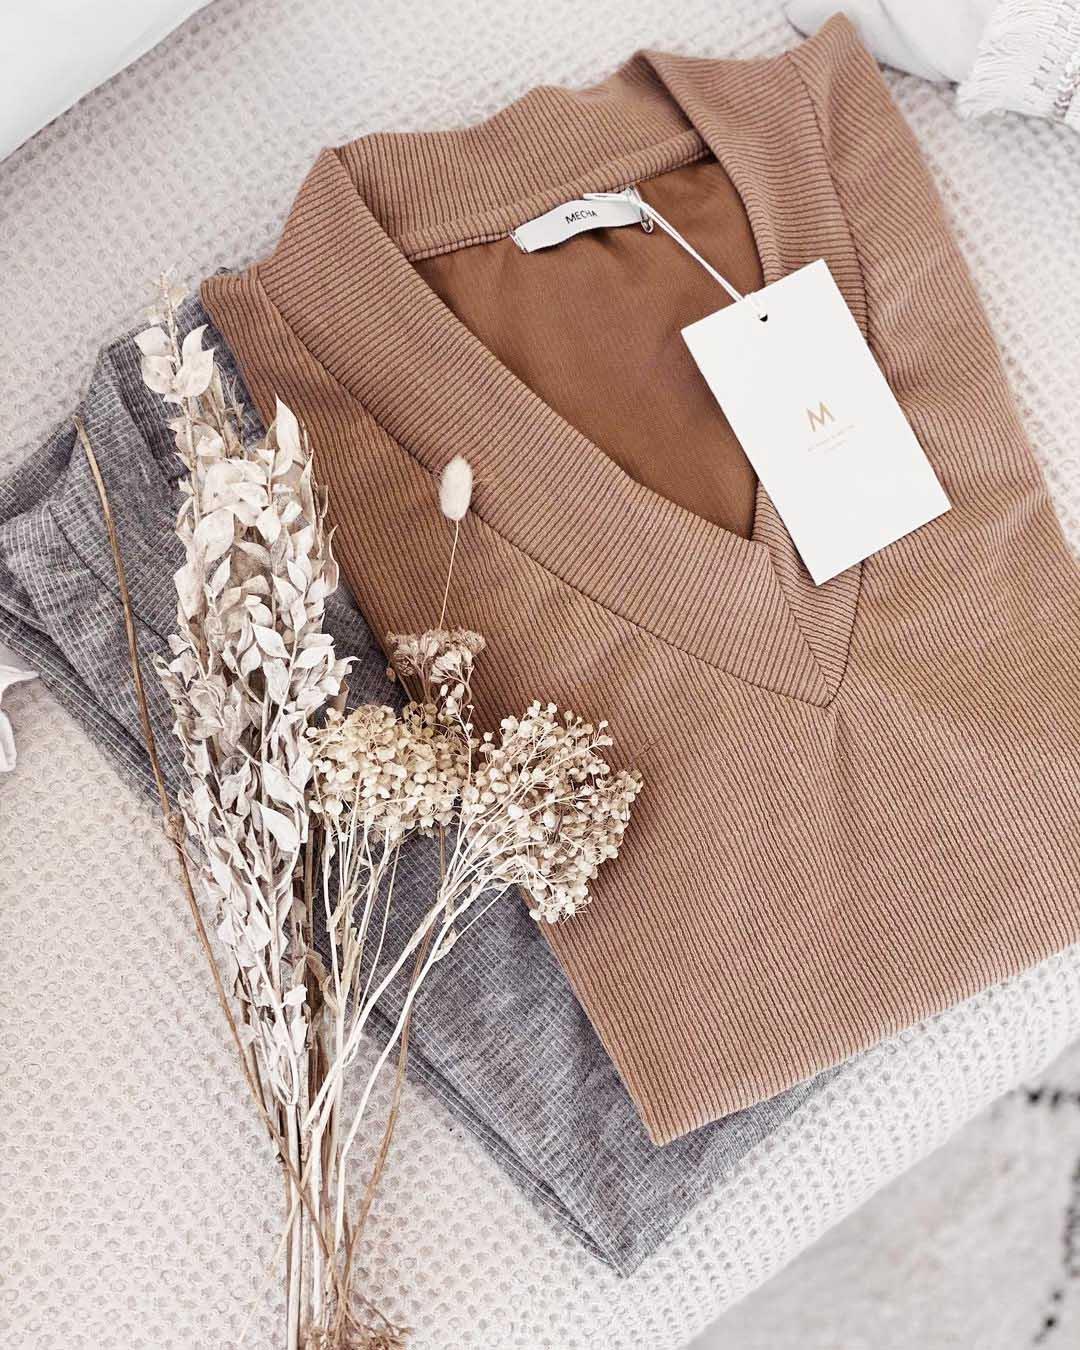 ropa de mujer invierno 2021 moda mujer sweaters de algodon